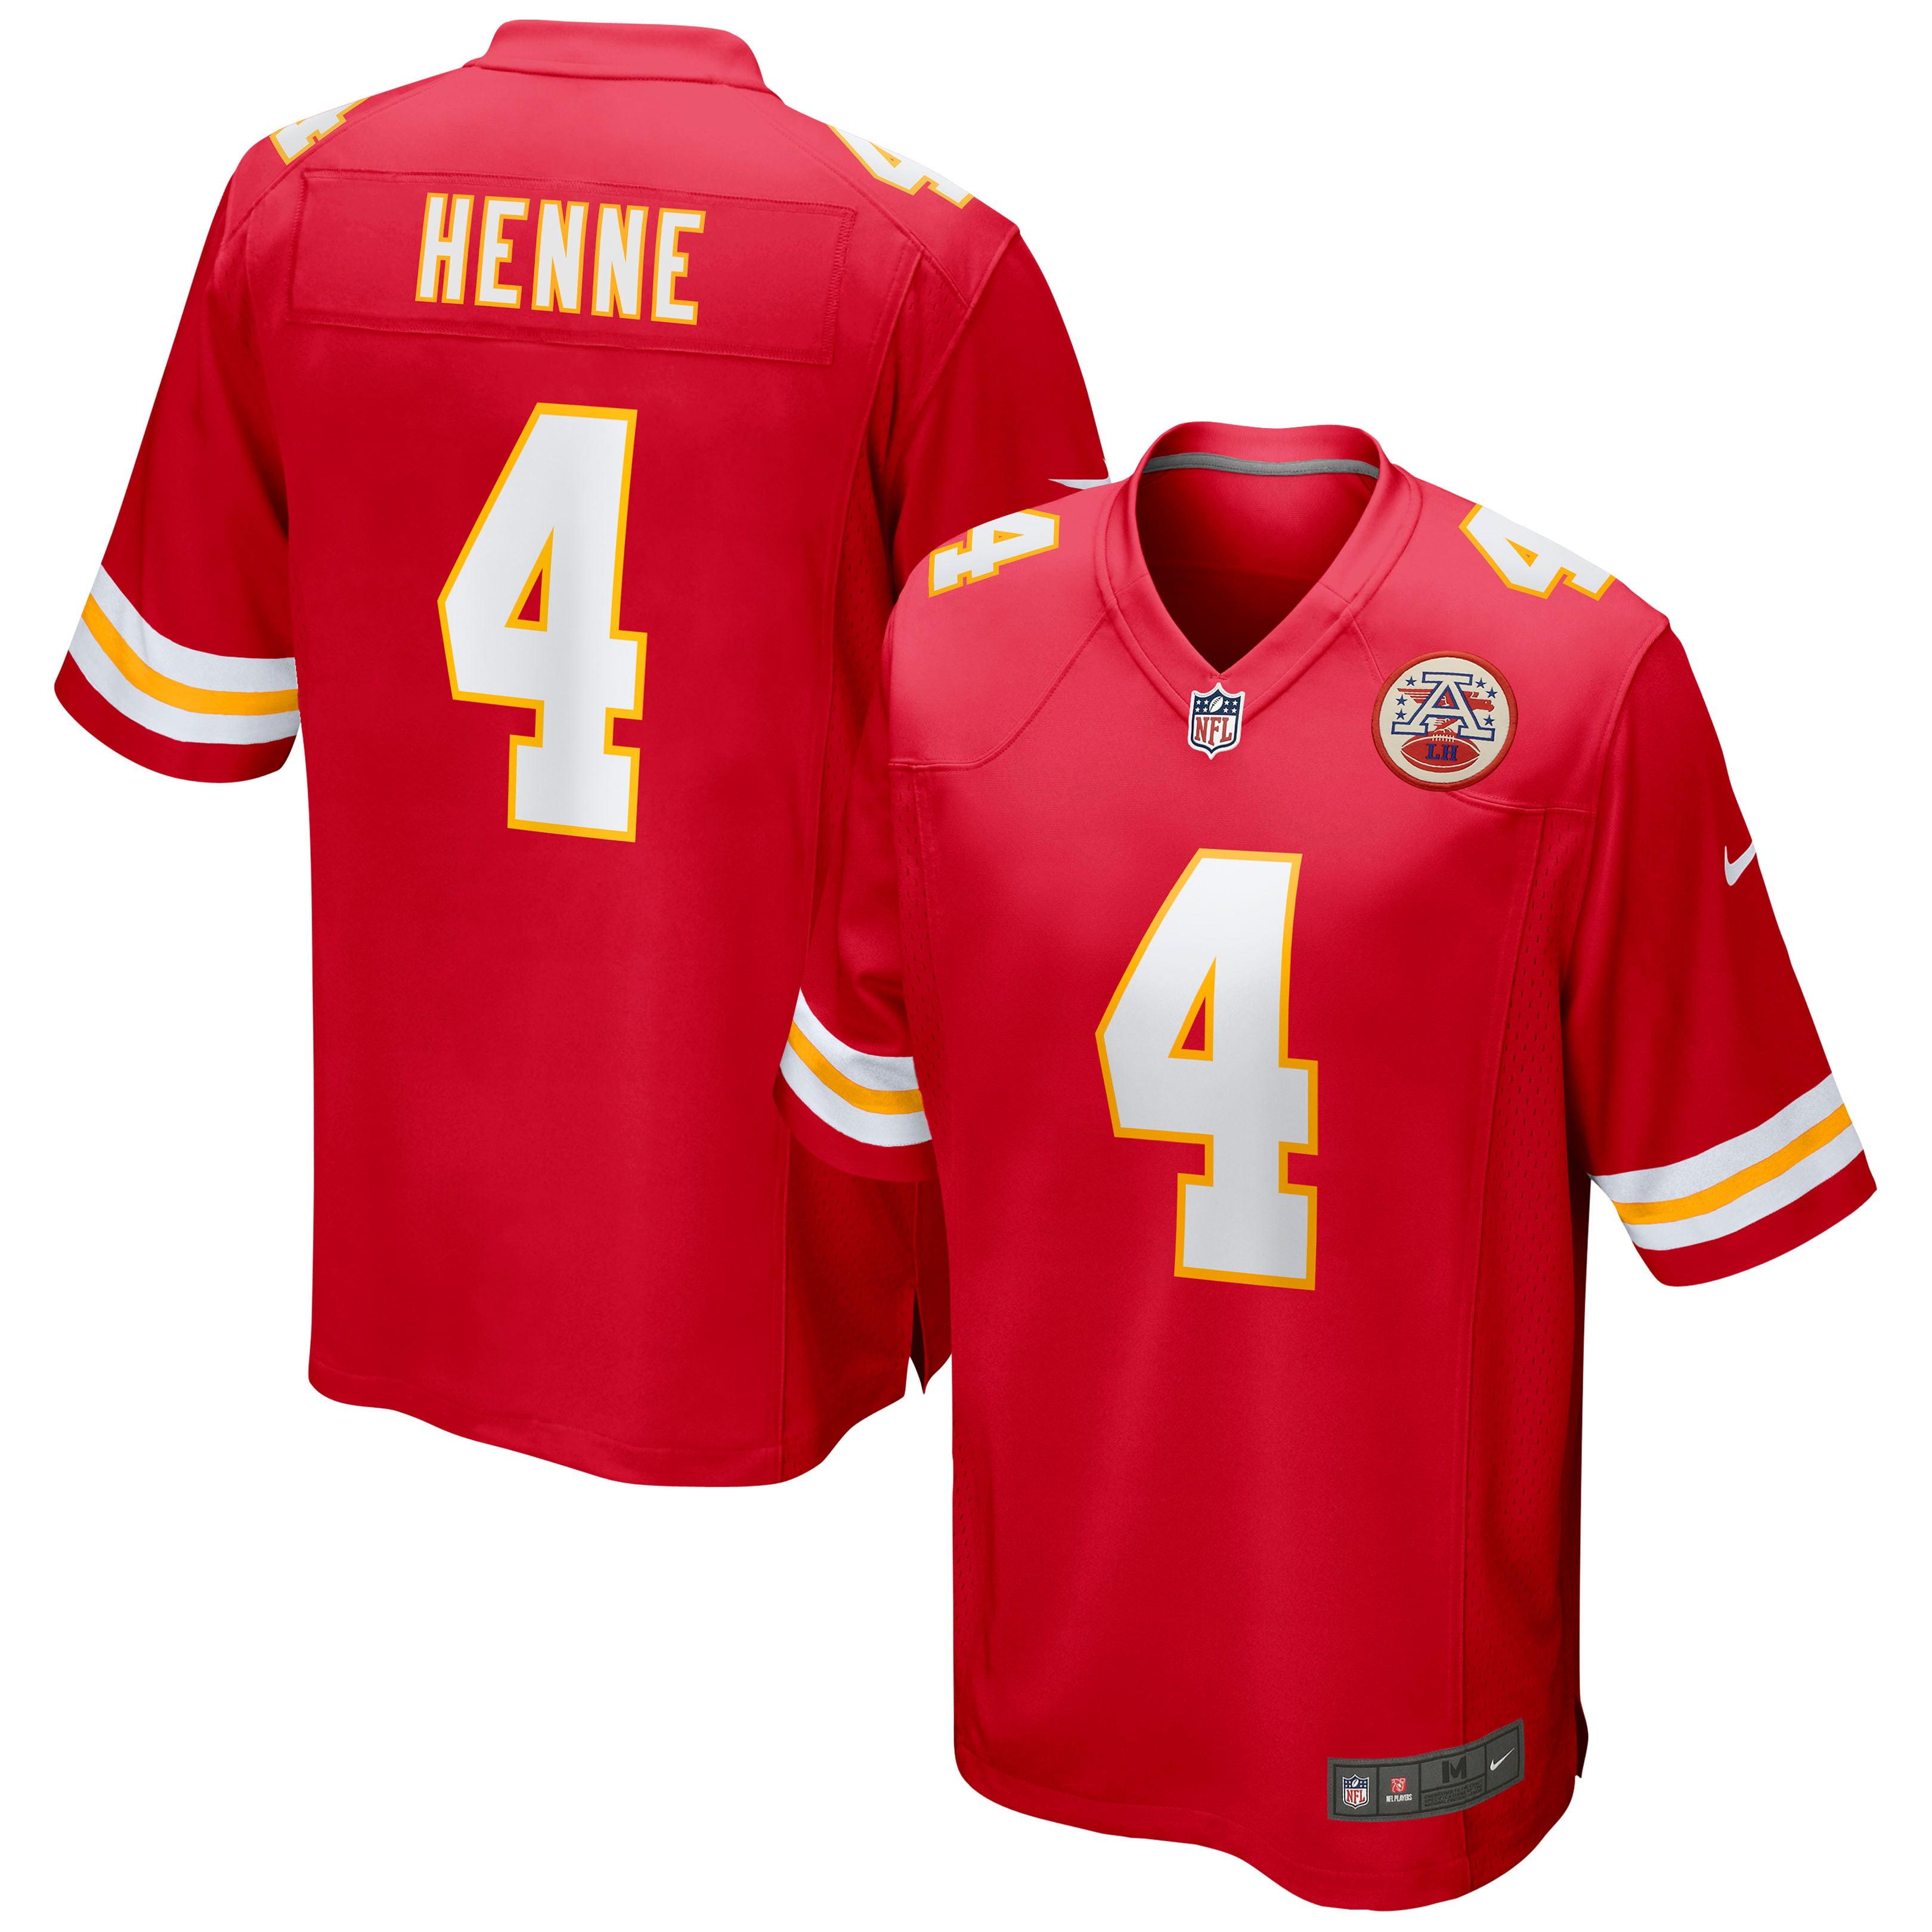 Chad Henne Kansas City Chiefs Nike Game Jersey - Red - Walmart.com